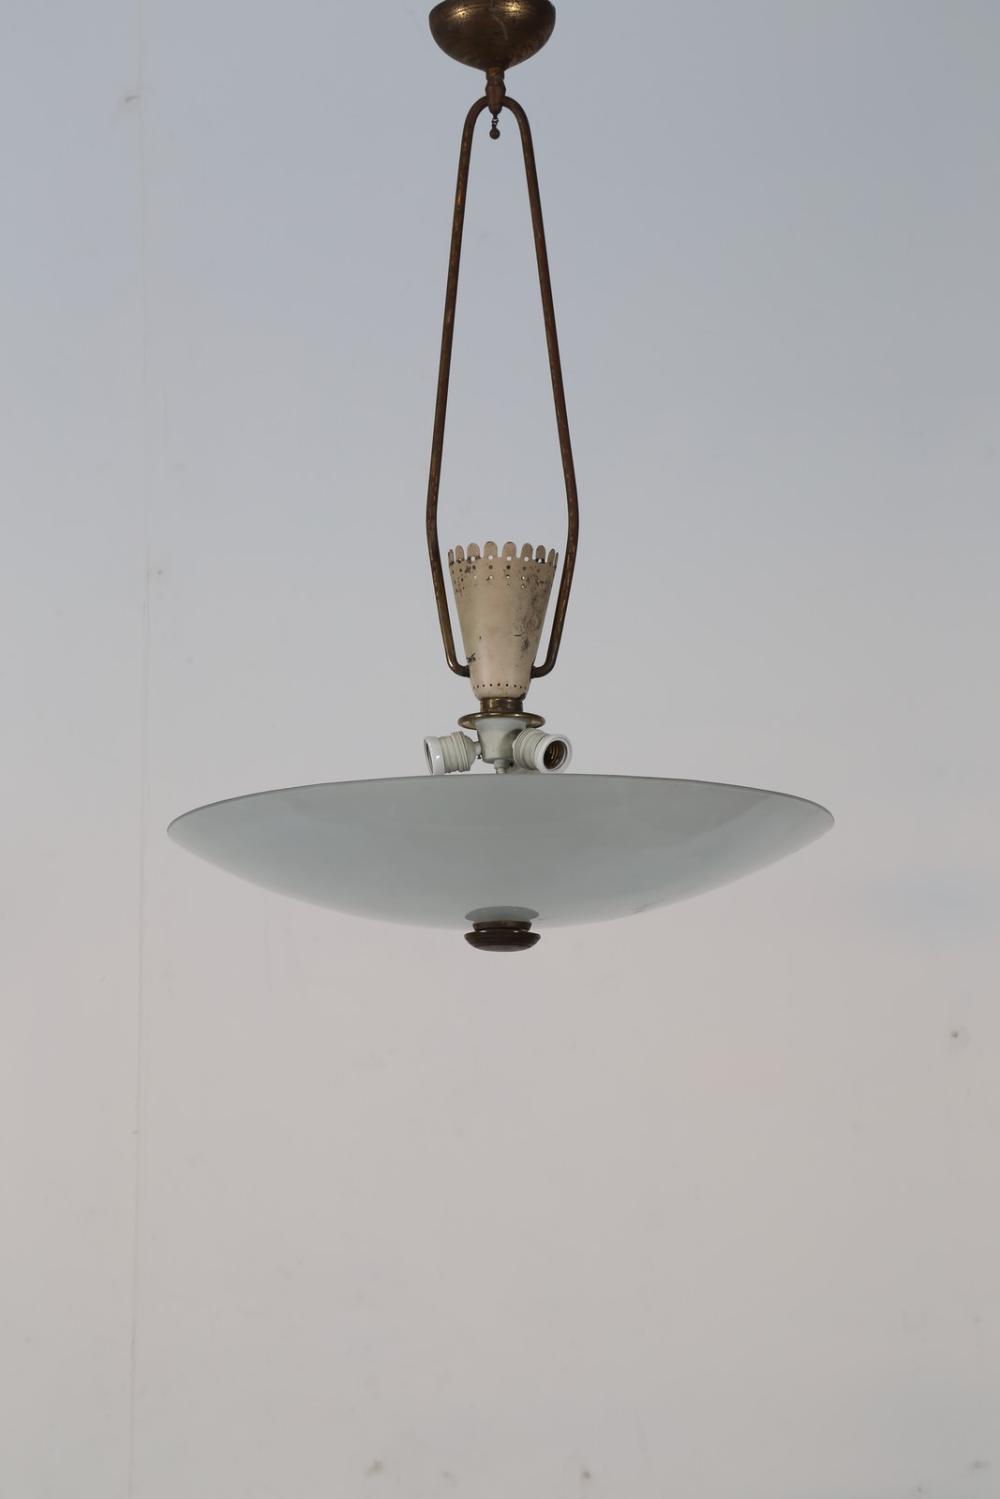 CHIESA PIETRO (1892 - 1948) Attributed Ceiling lamp